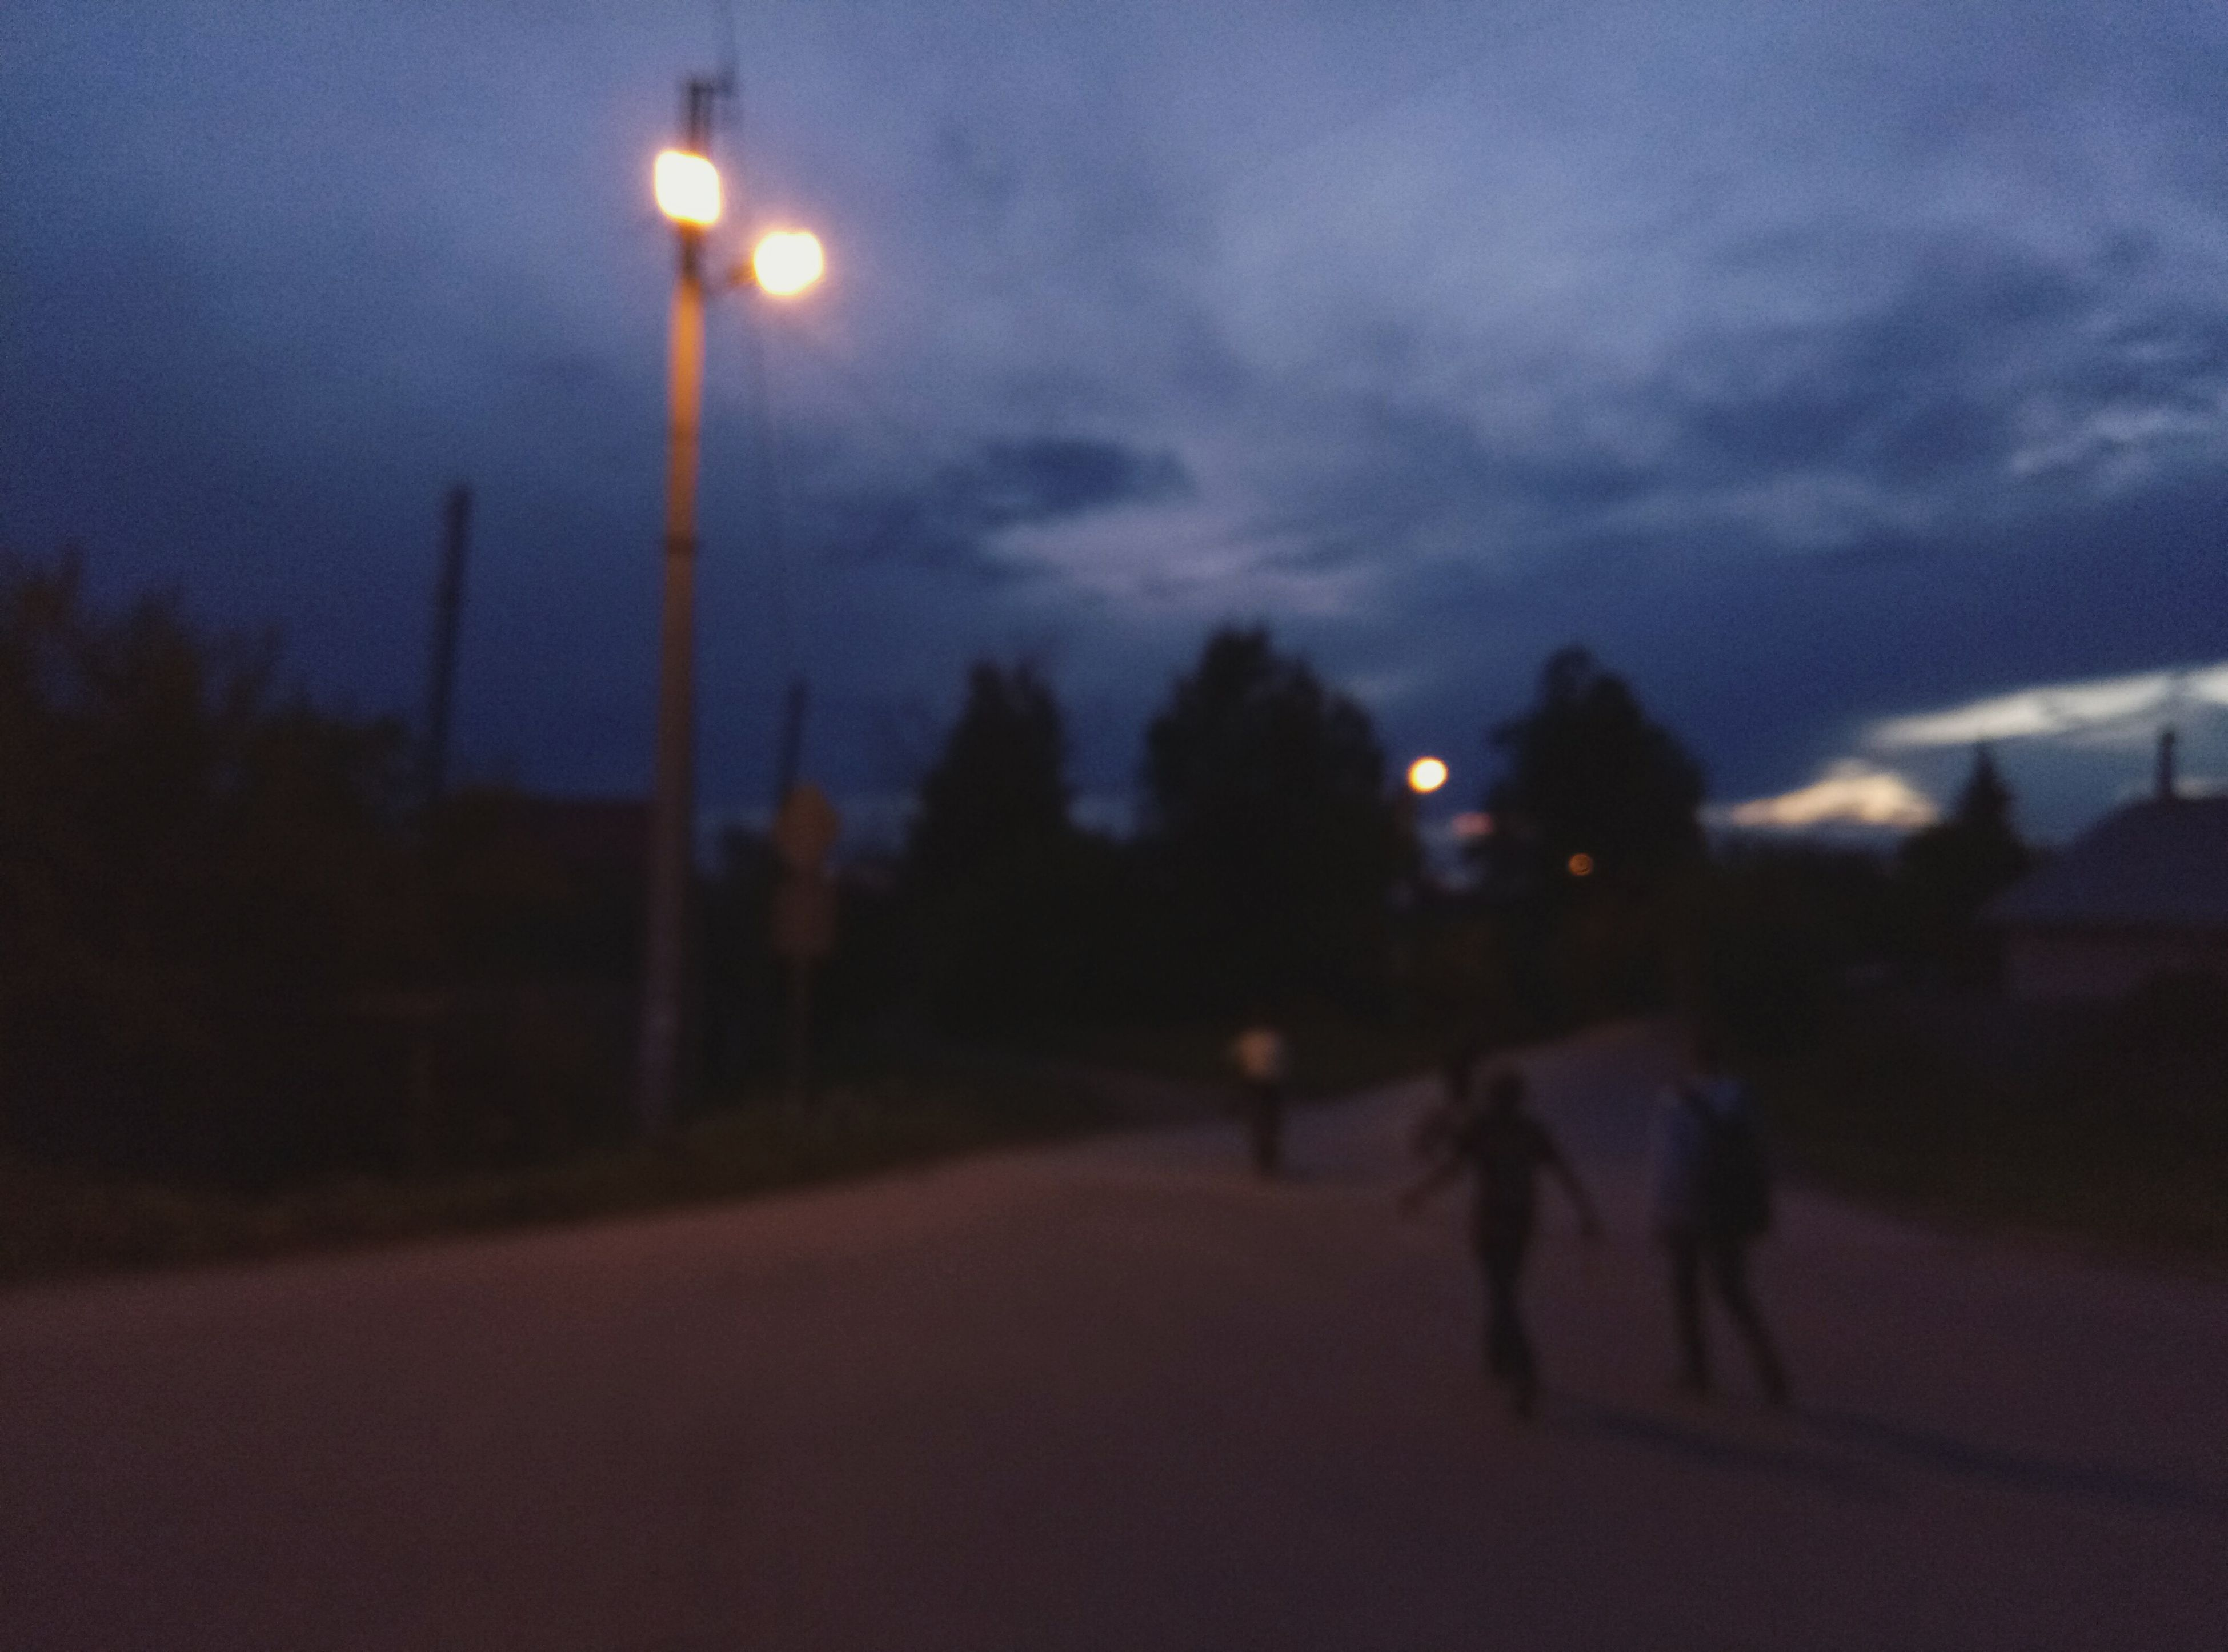 sky, illuminated, road, street light, night, outdoors, nature, sunset, tree, no people